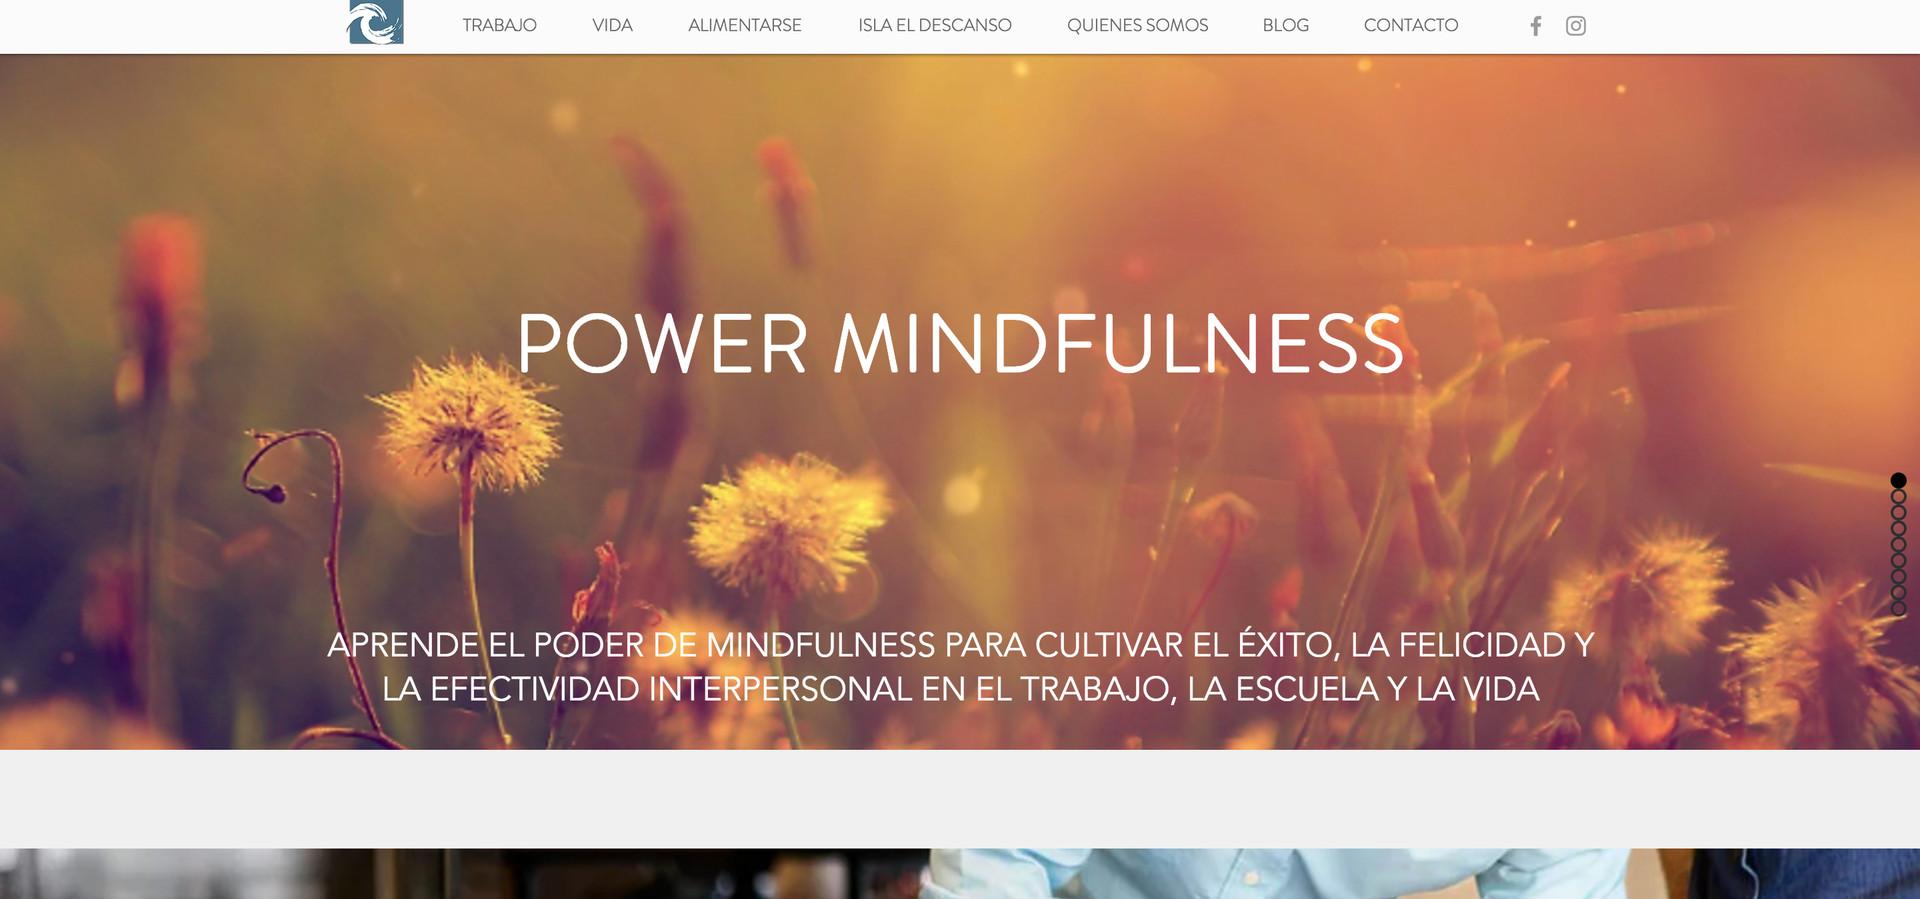 Power Mindfulness - Sitio